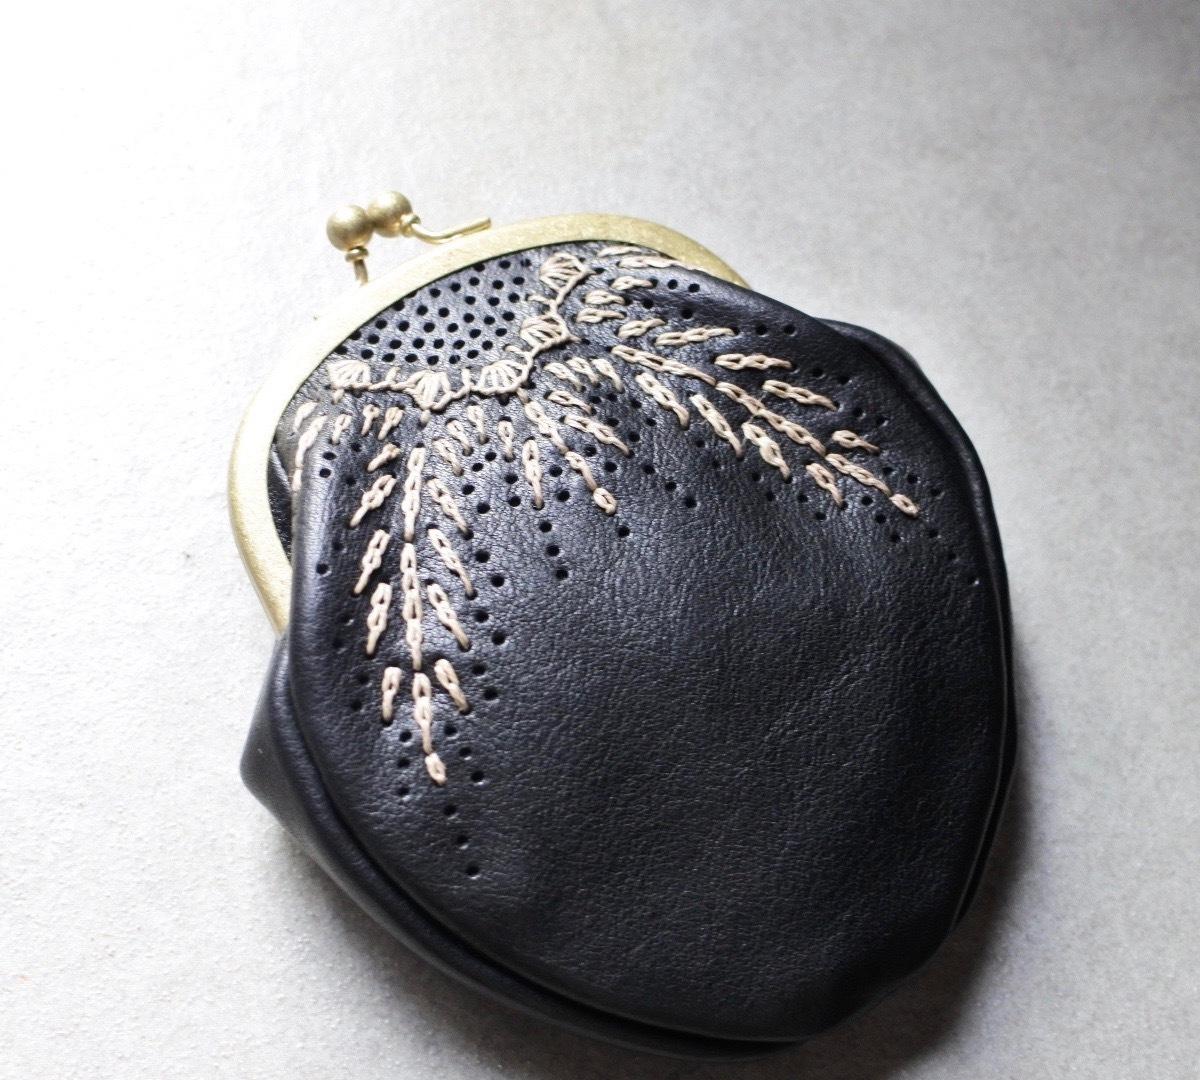 Yammart(ヤマート) / 刺繍r&l stitch pouch(black)